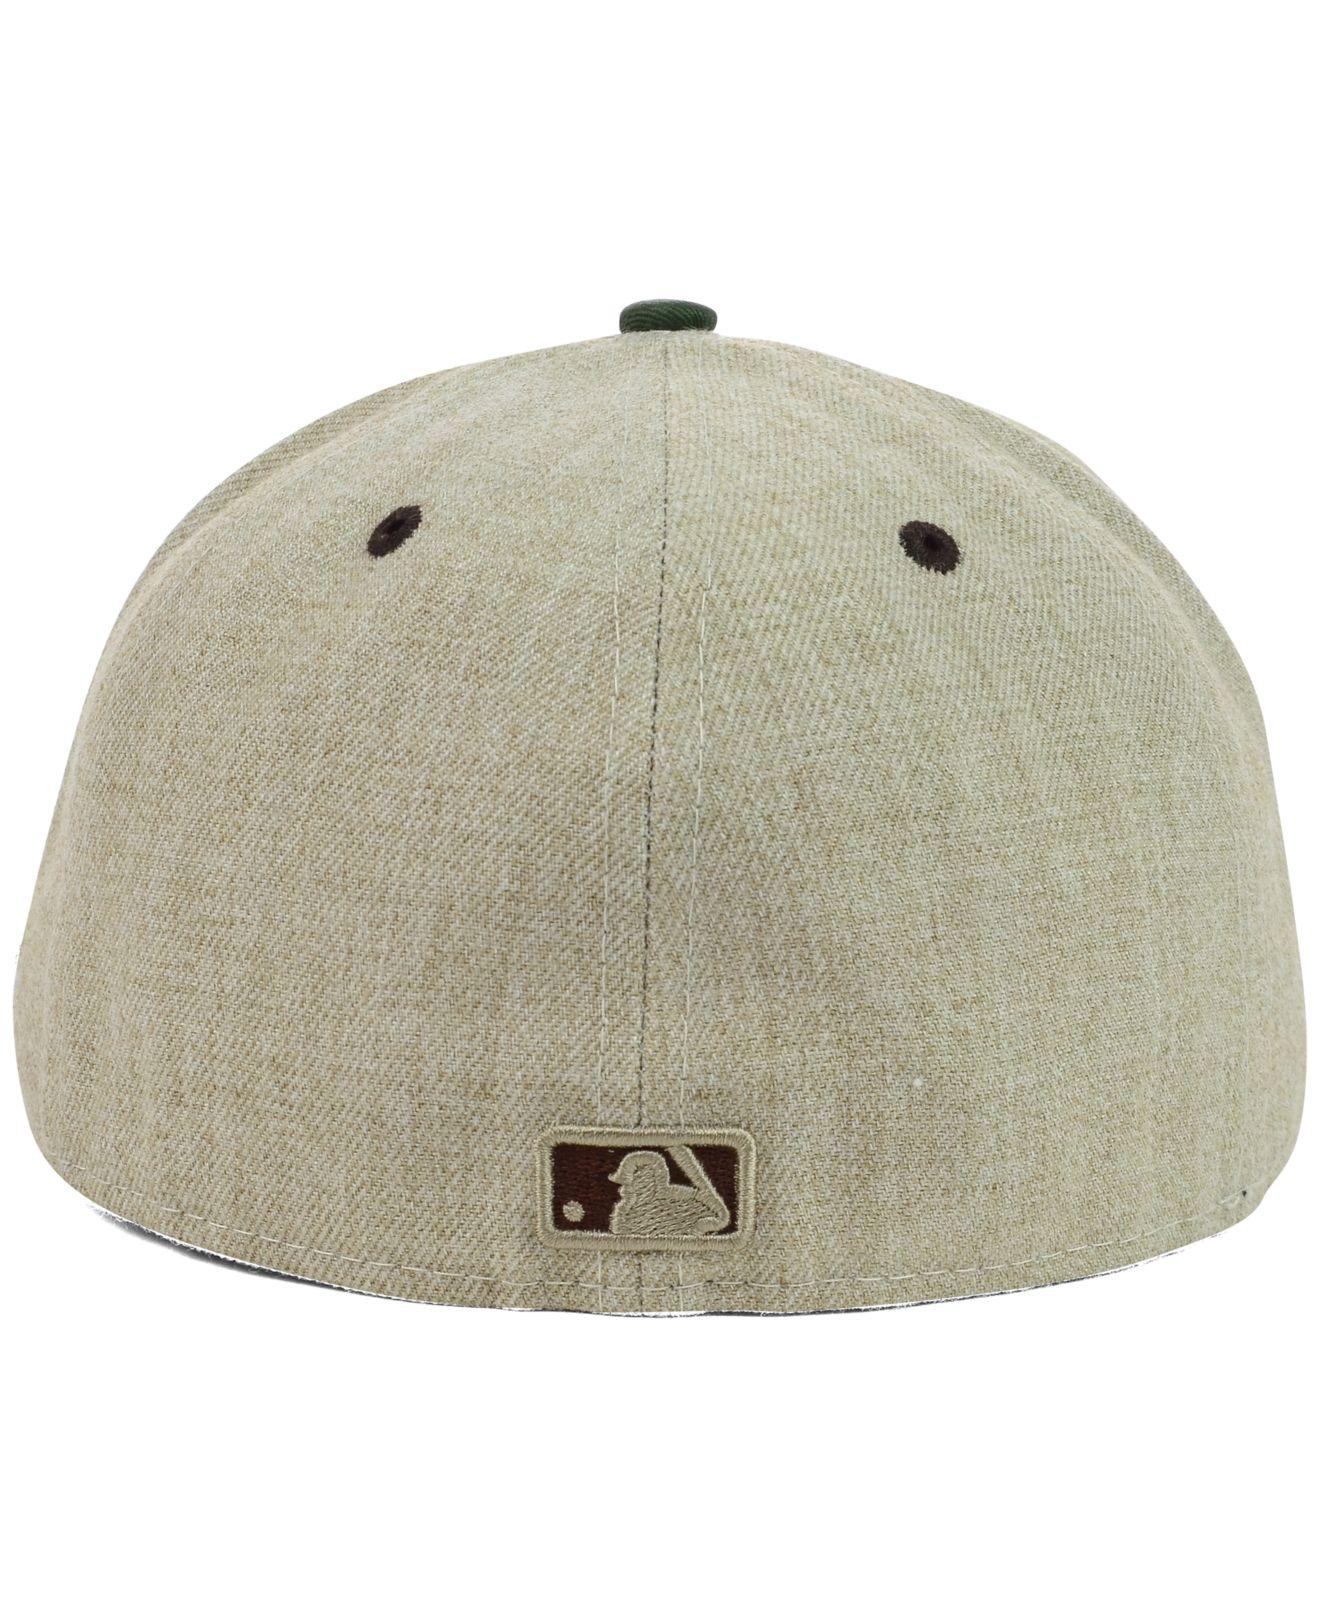 1cc6b6d0085 cheap lyst ktz new york yankees heather mashup 59fifty cap in natural faad8  7d50b